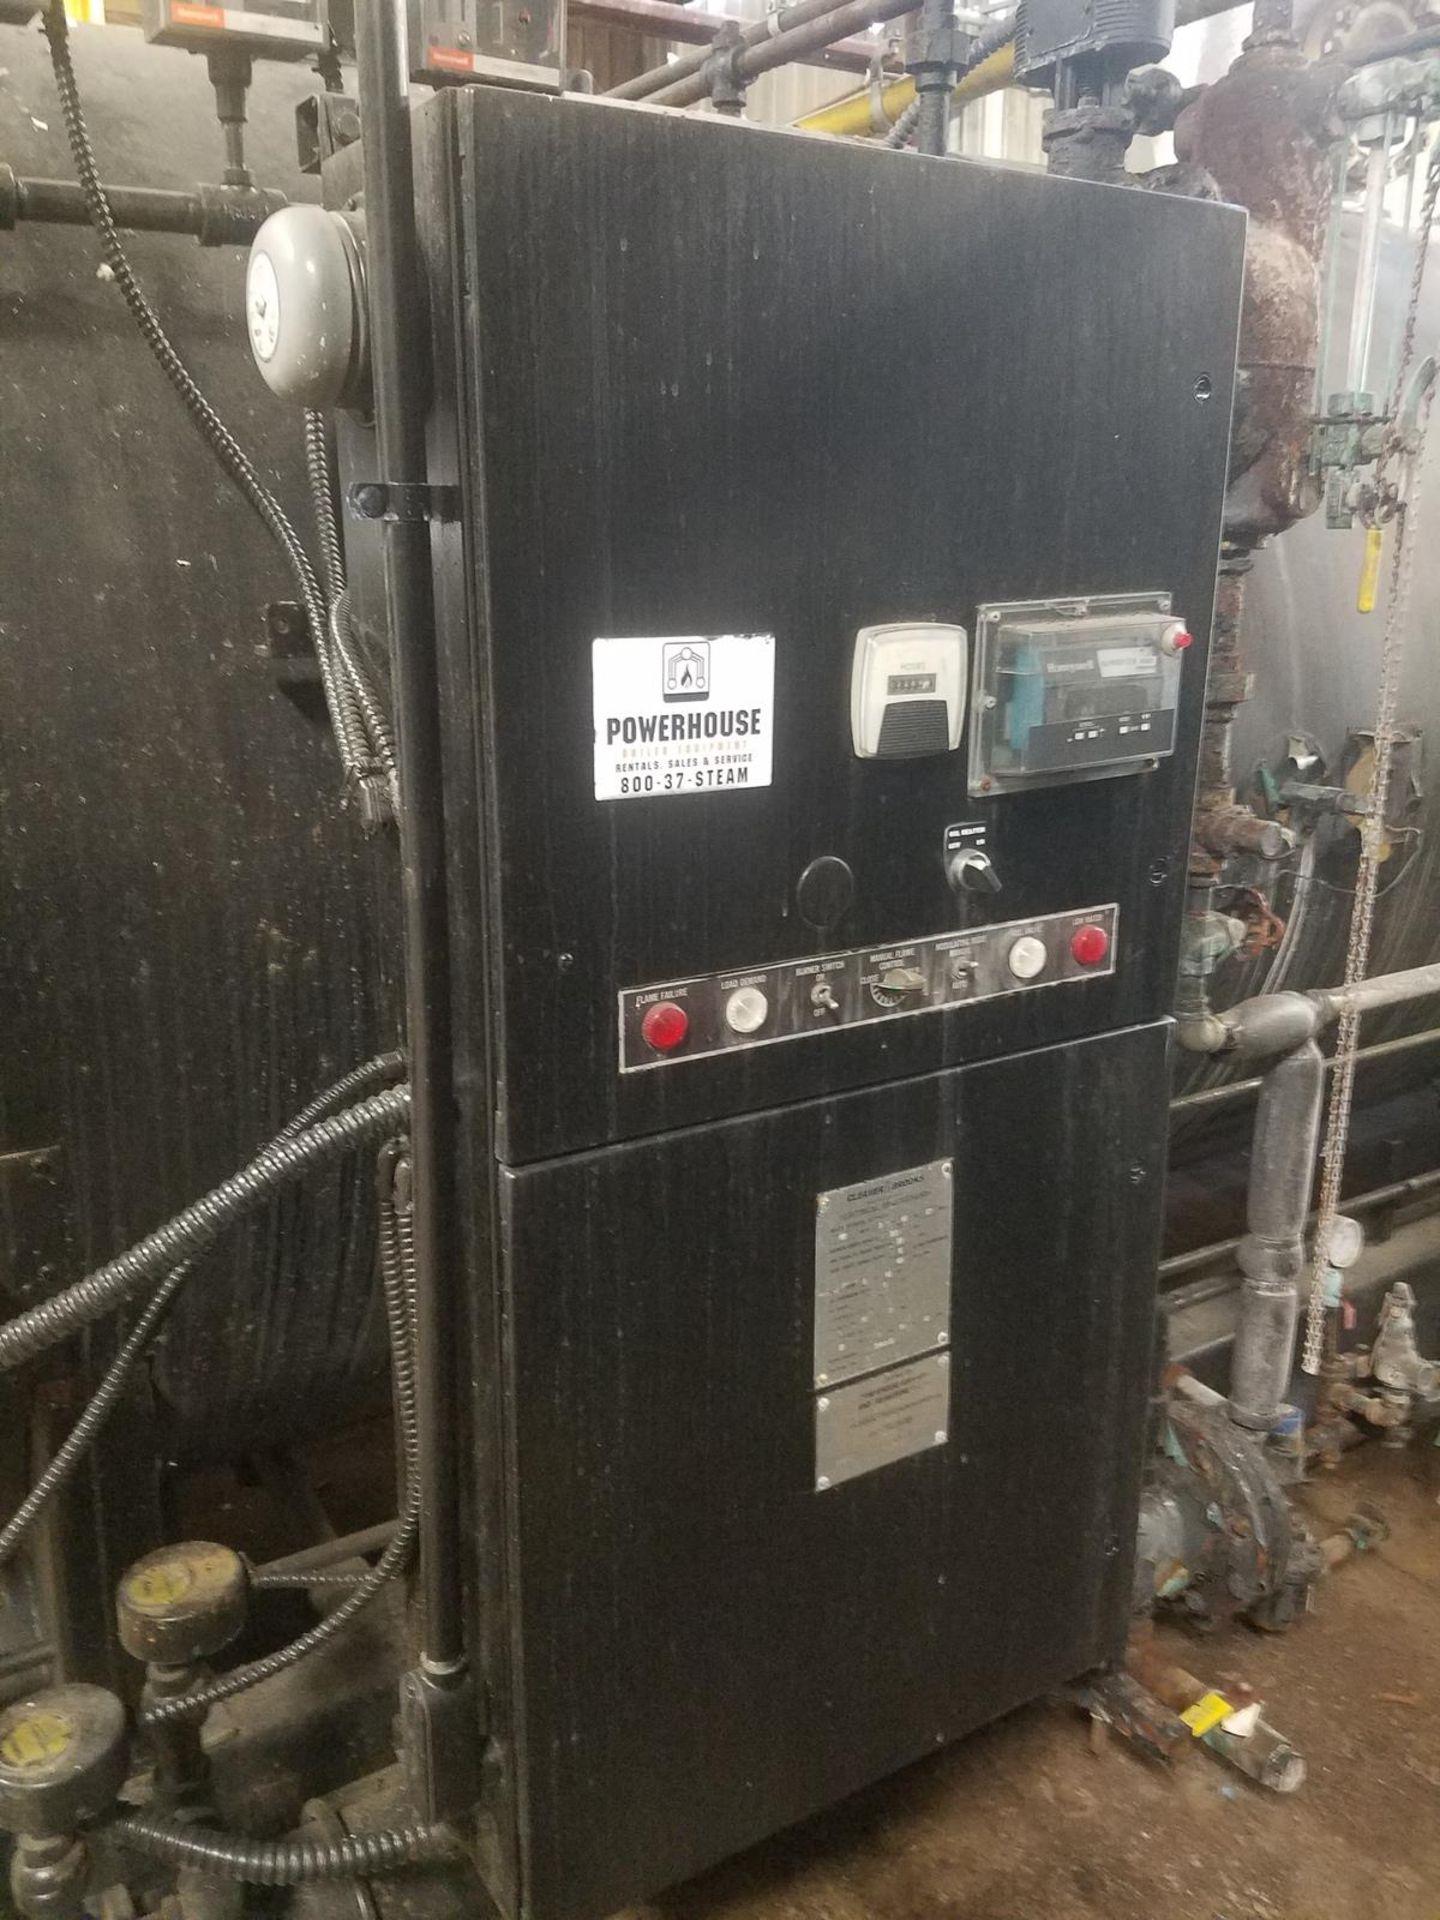 2009 (Rebuilt 2016) 250 HP Cleaver Brooks Boiler, 8.9 mmBTU, M# CB-200-250S-250, | Rig Fee: $5000 - Image 5 of 8